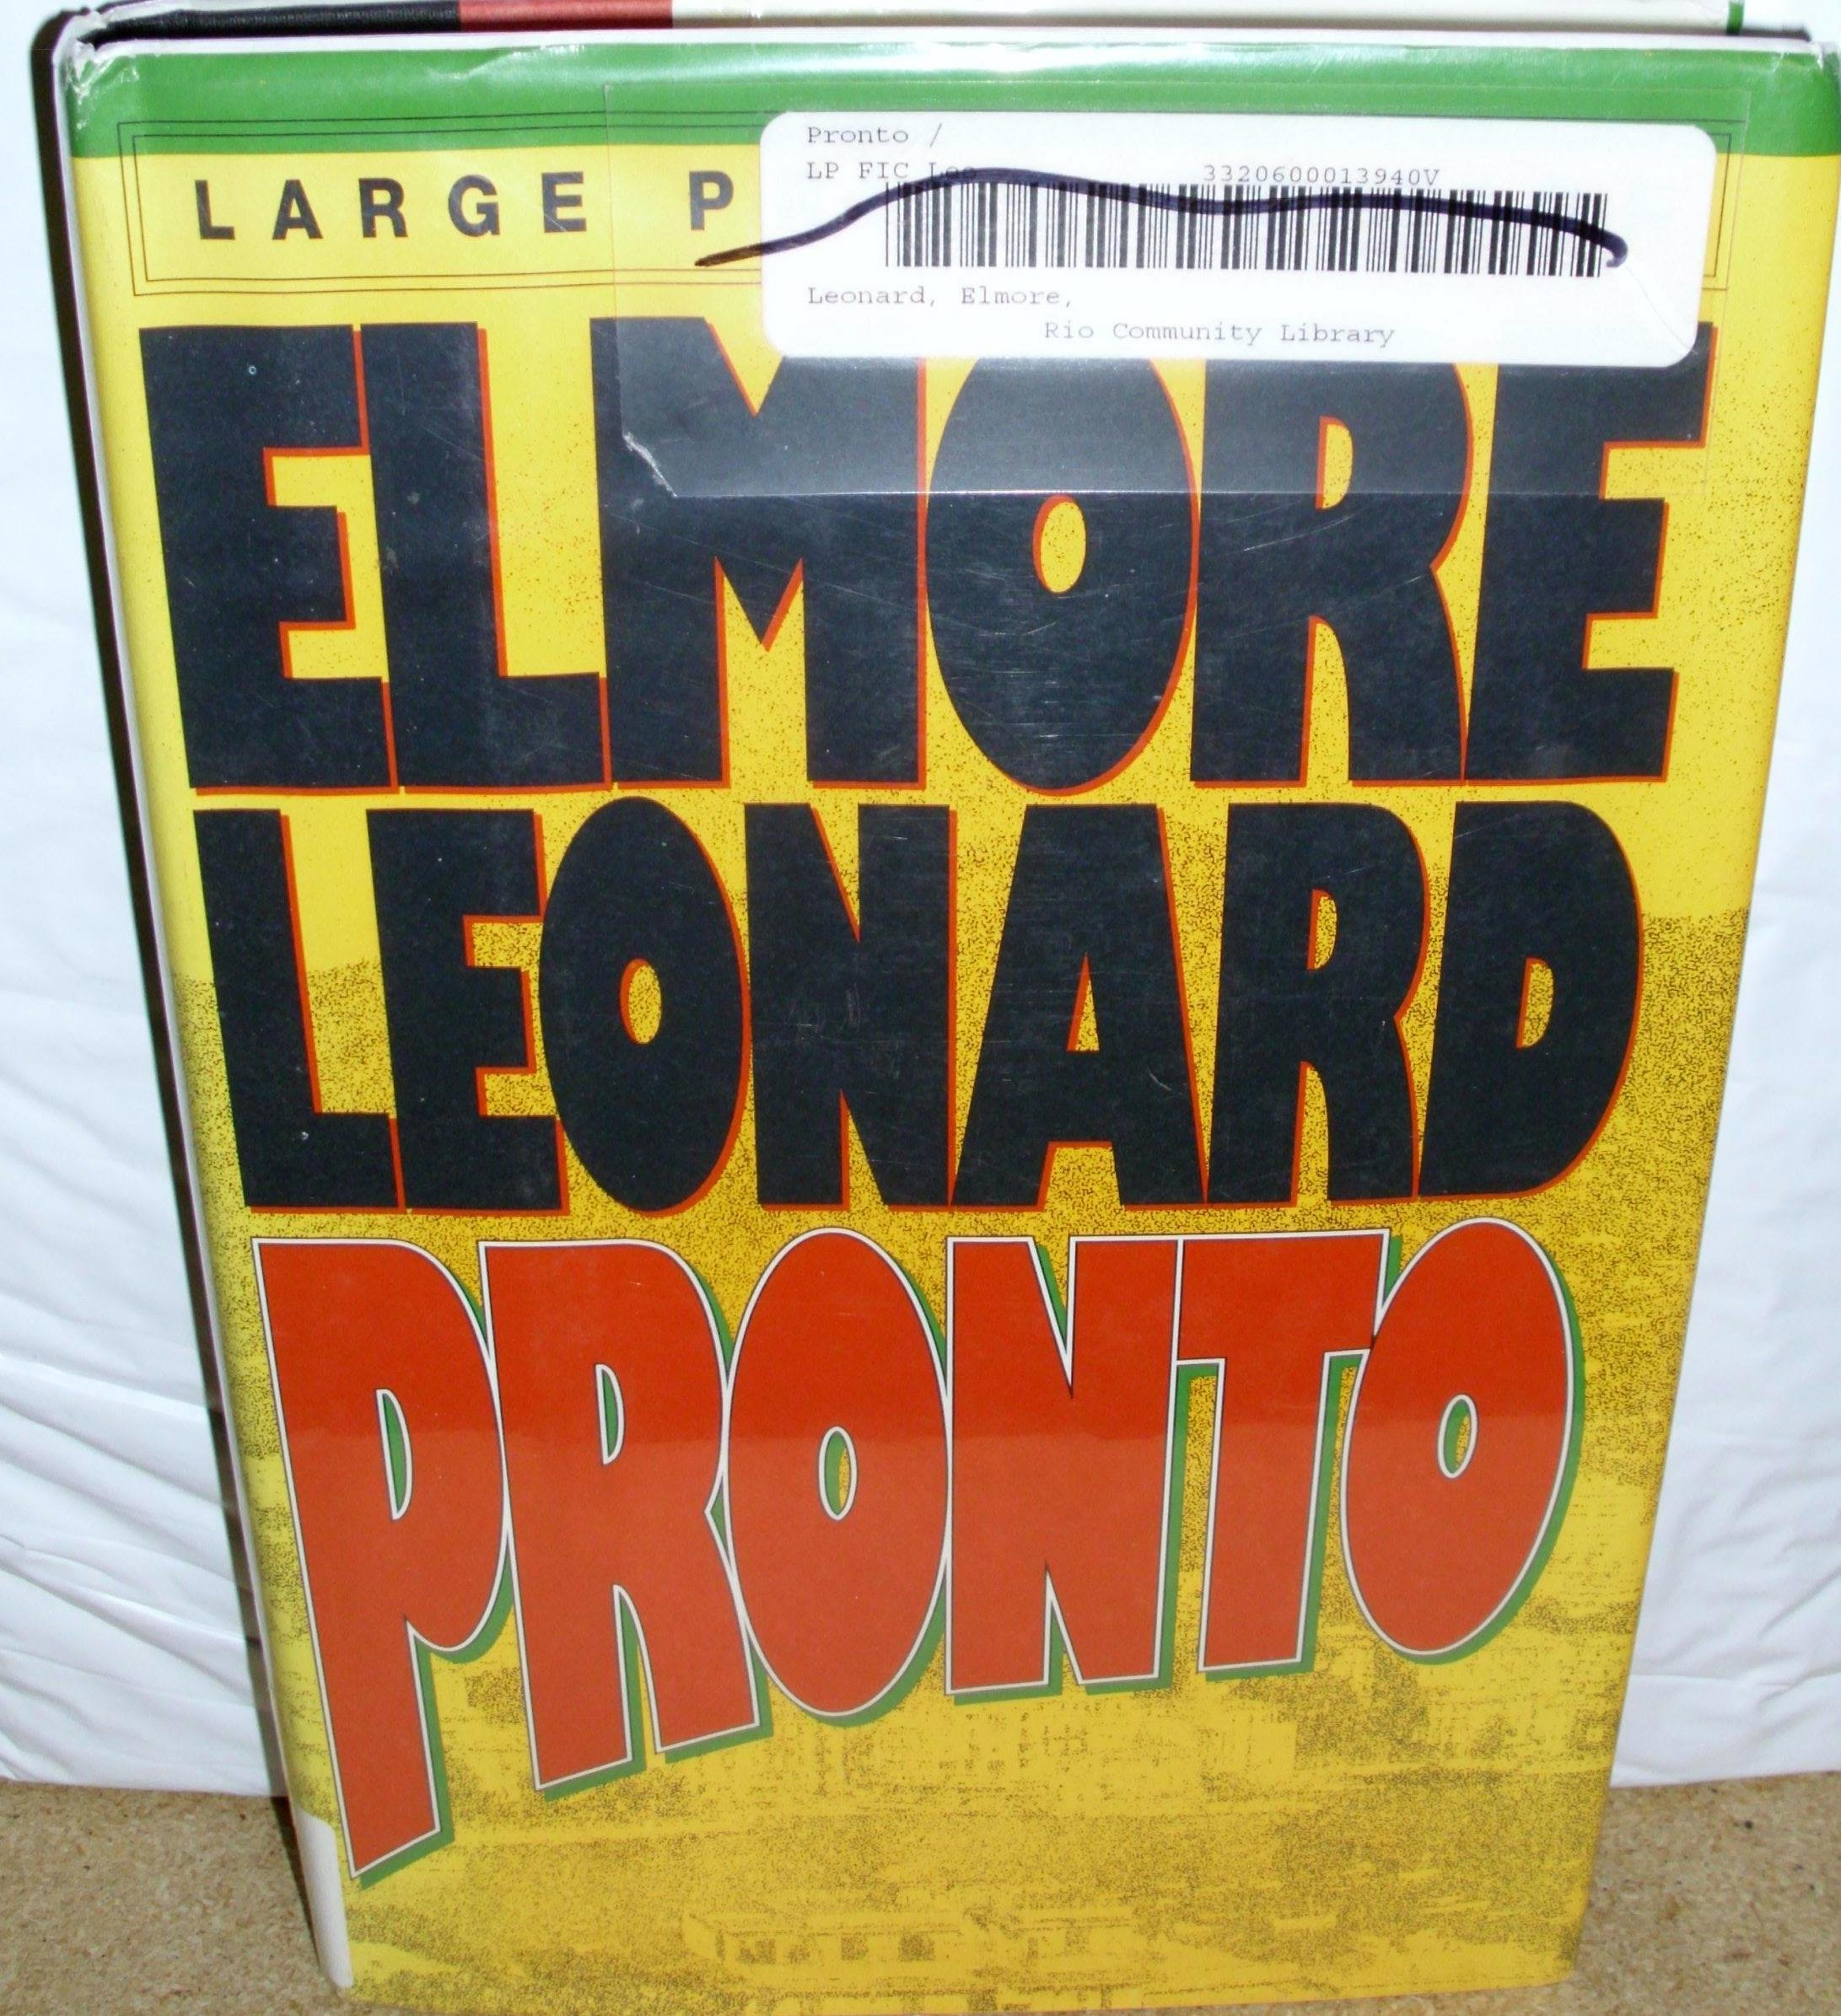 Pronto: Amazon.es: Elmore Leonard: Libros en idiomas extranjeros